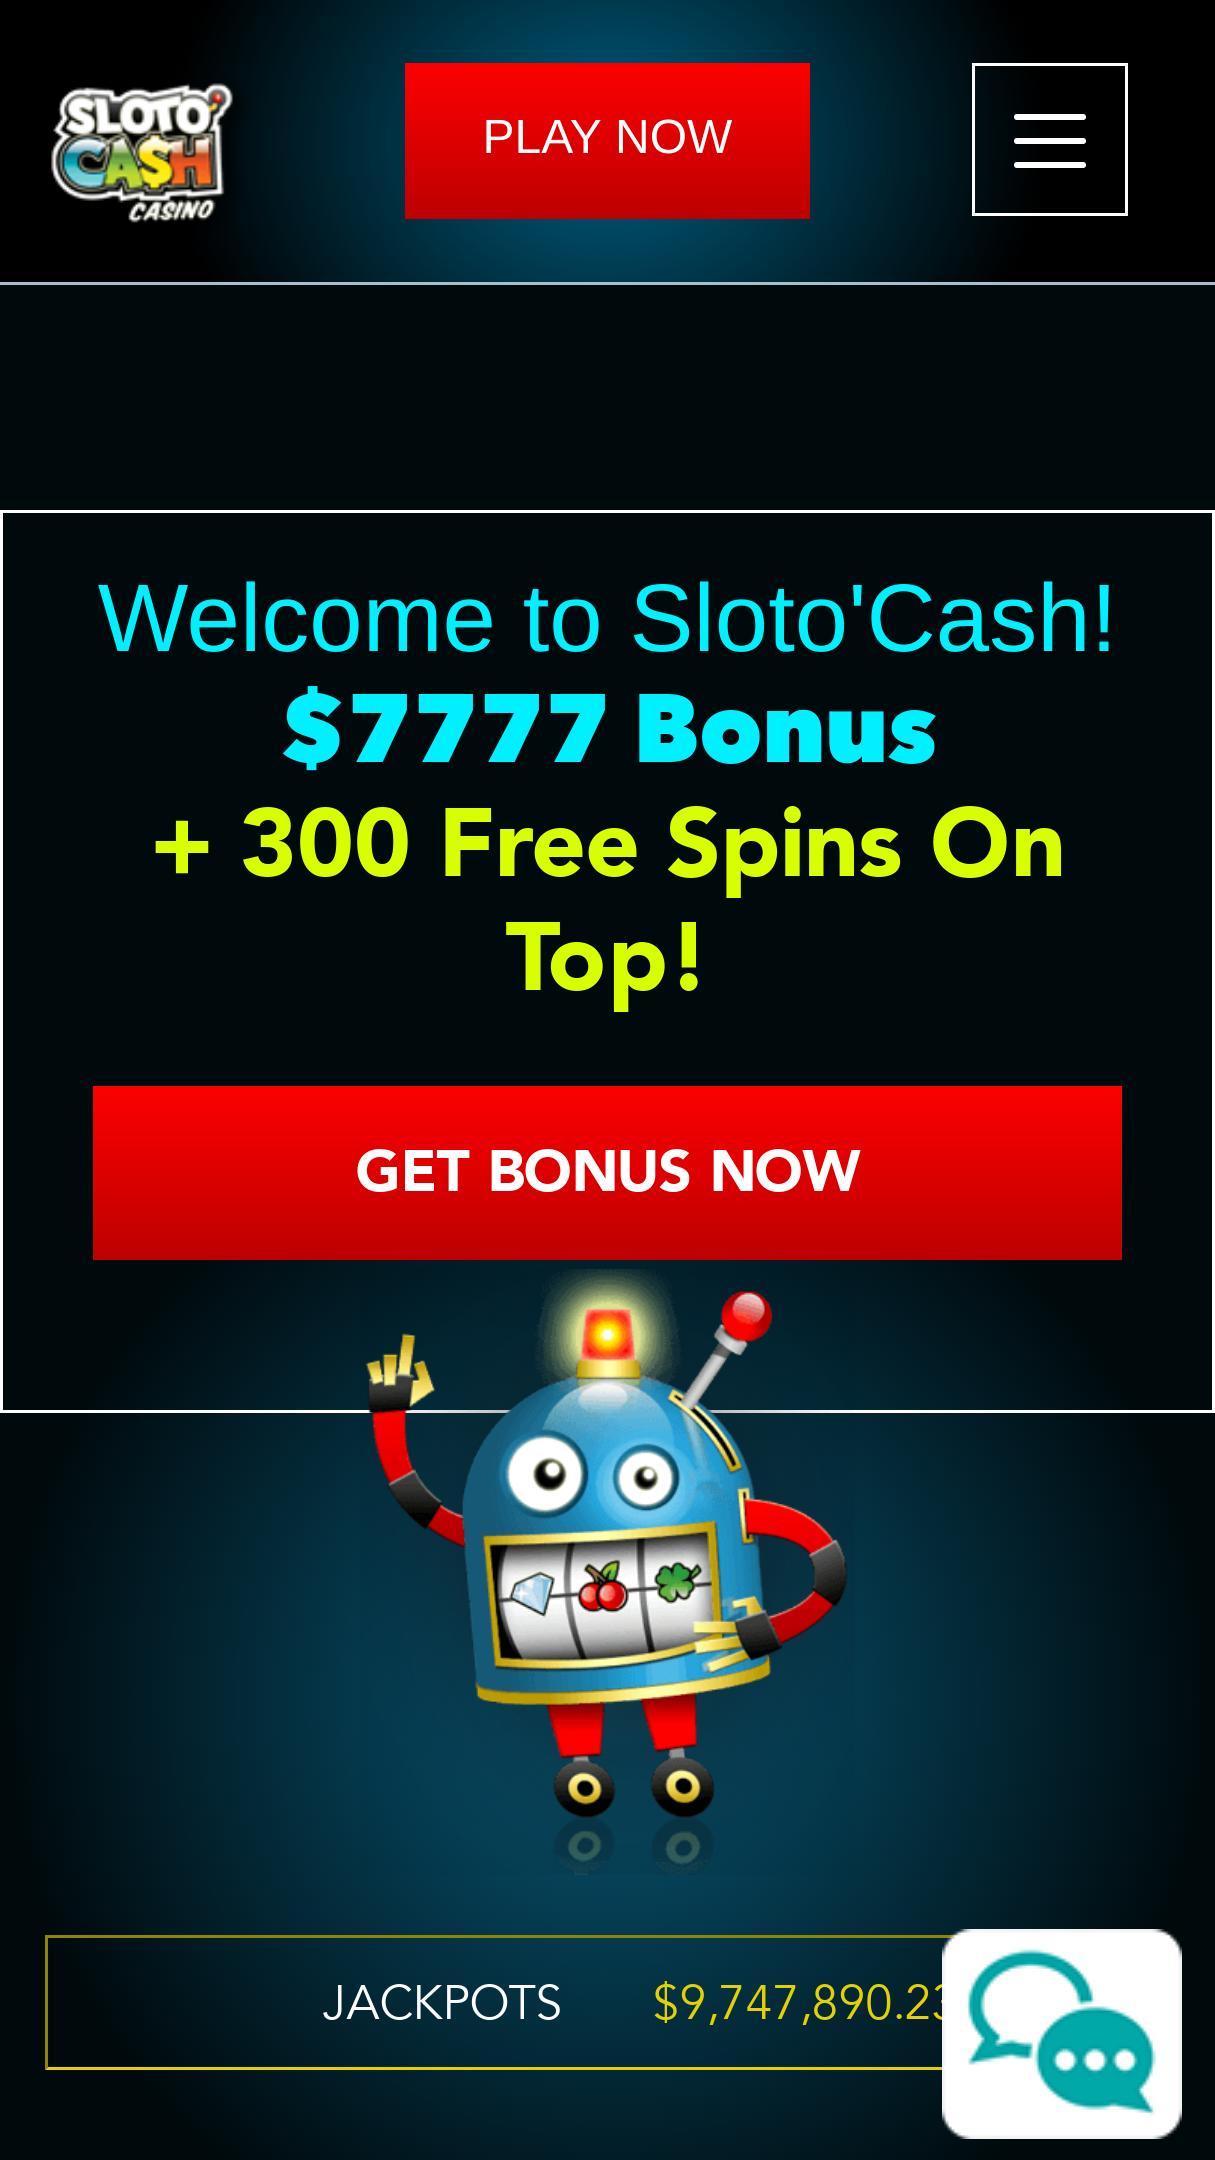 Slotocash No Deposit Code 2021